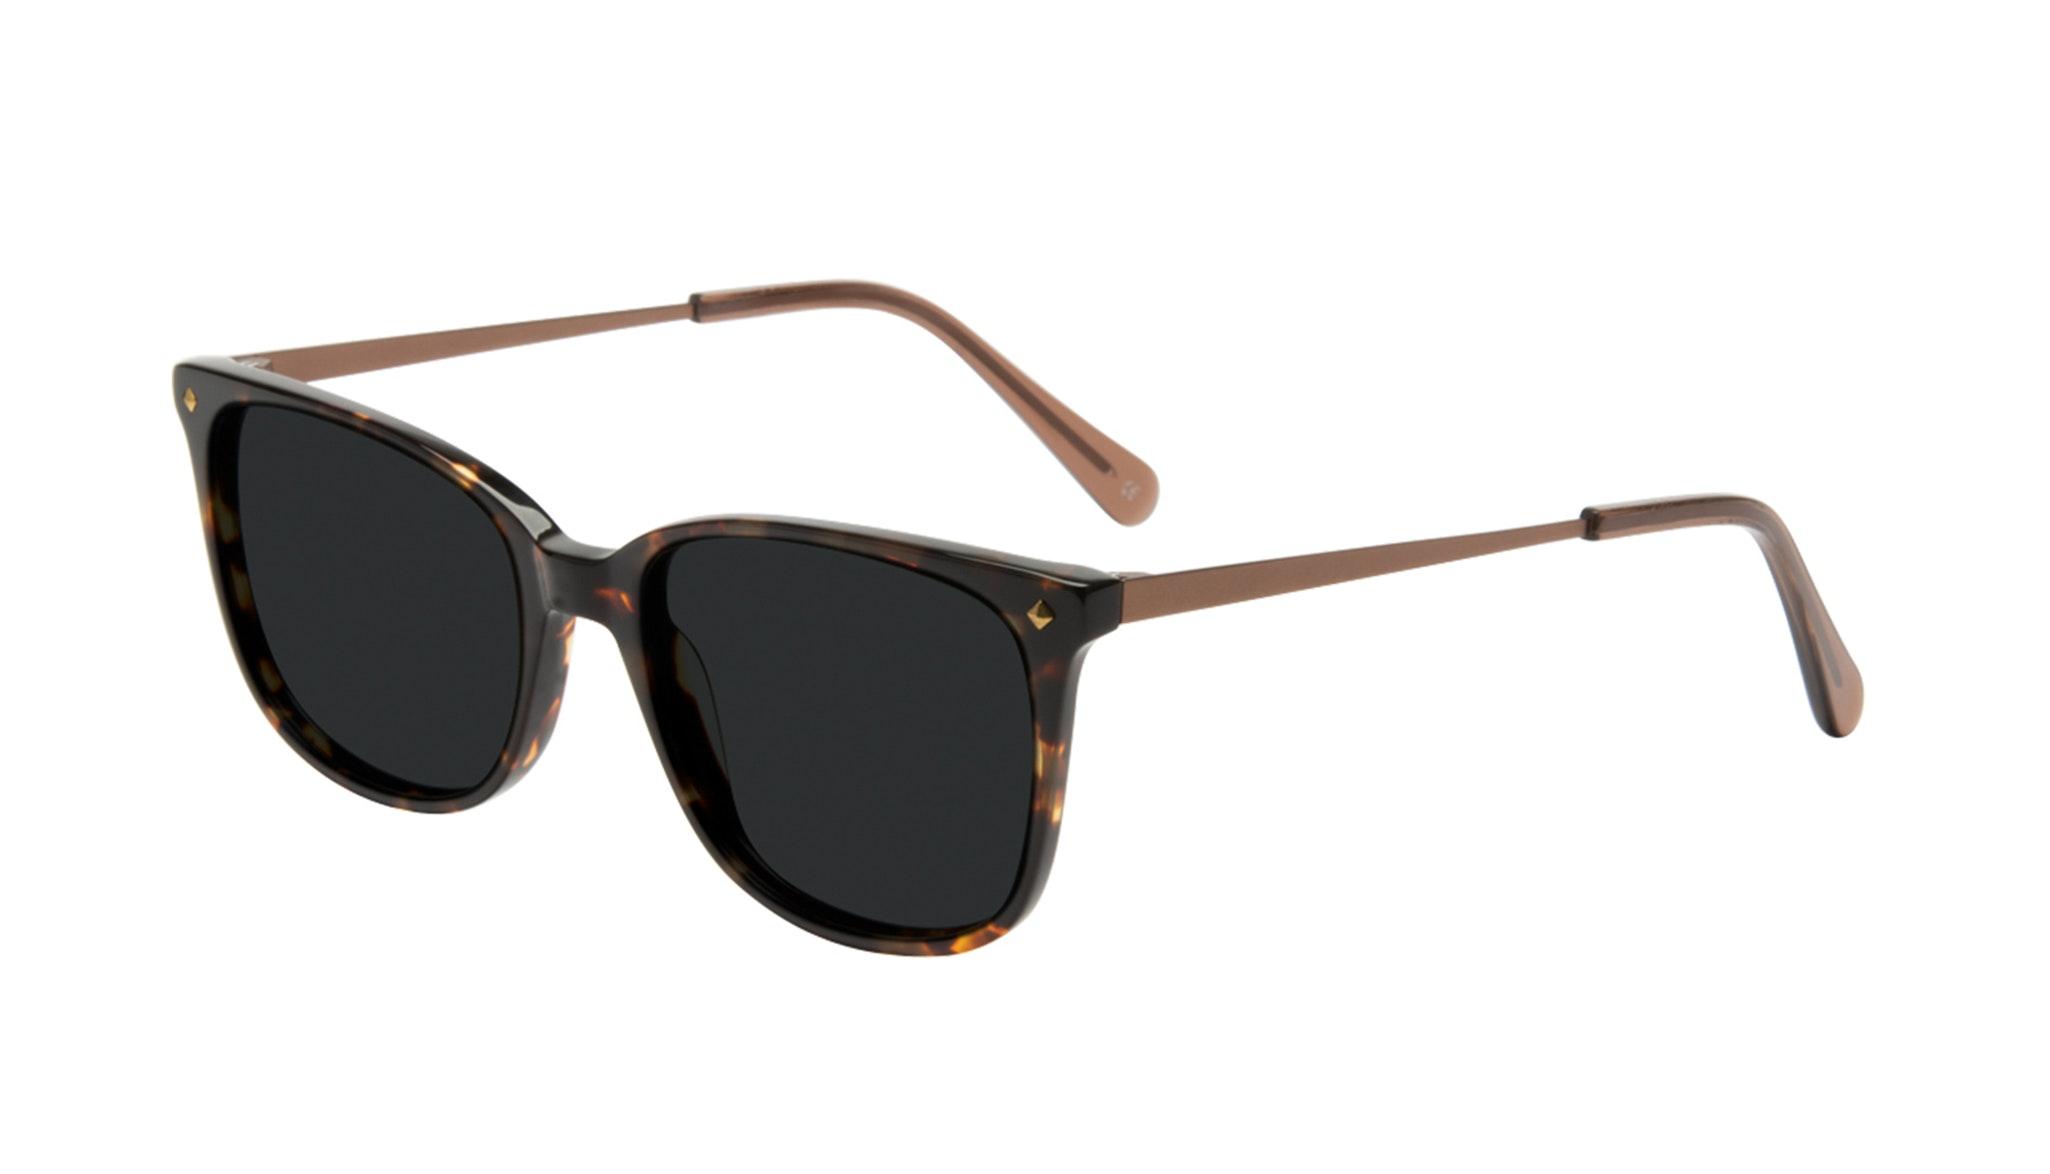 Affordable Fashion Glasses Rectangle Square Sunglasses Women Refine Tortoise Tilt